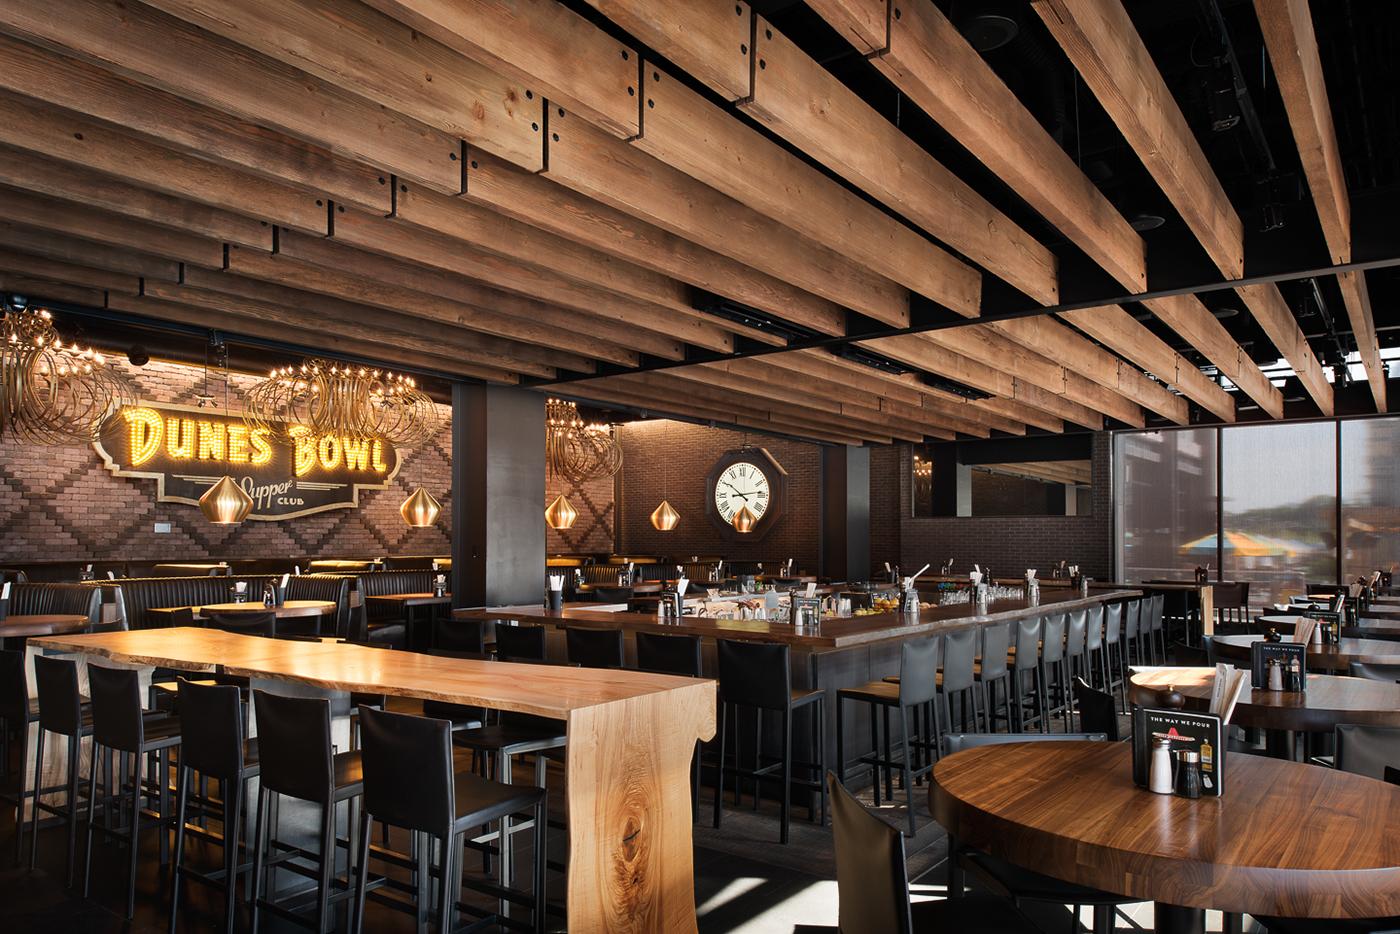 Joey restaurants lansdowne ottawa on behance